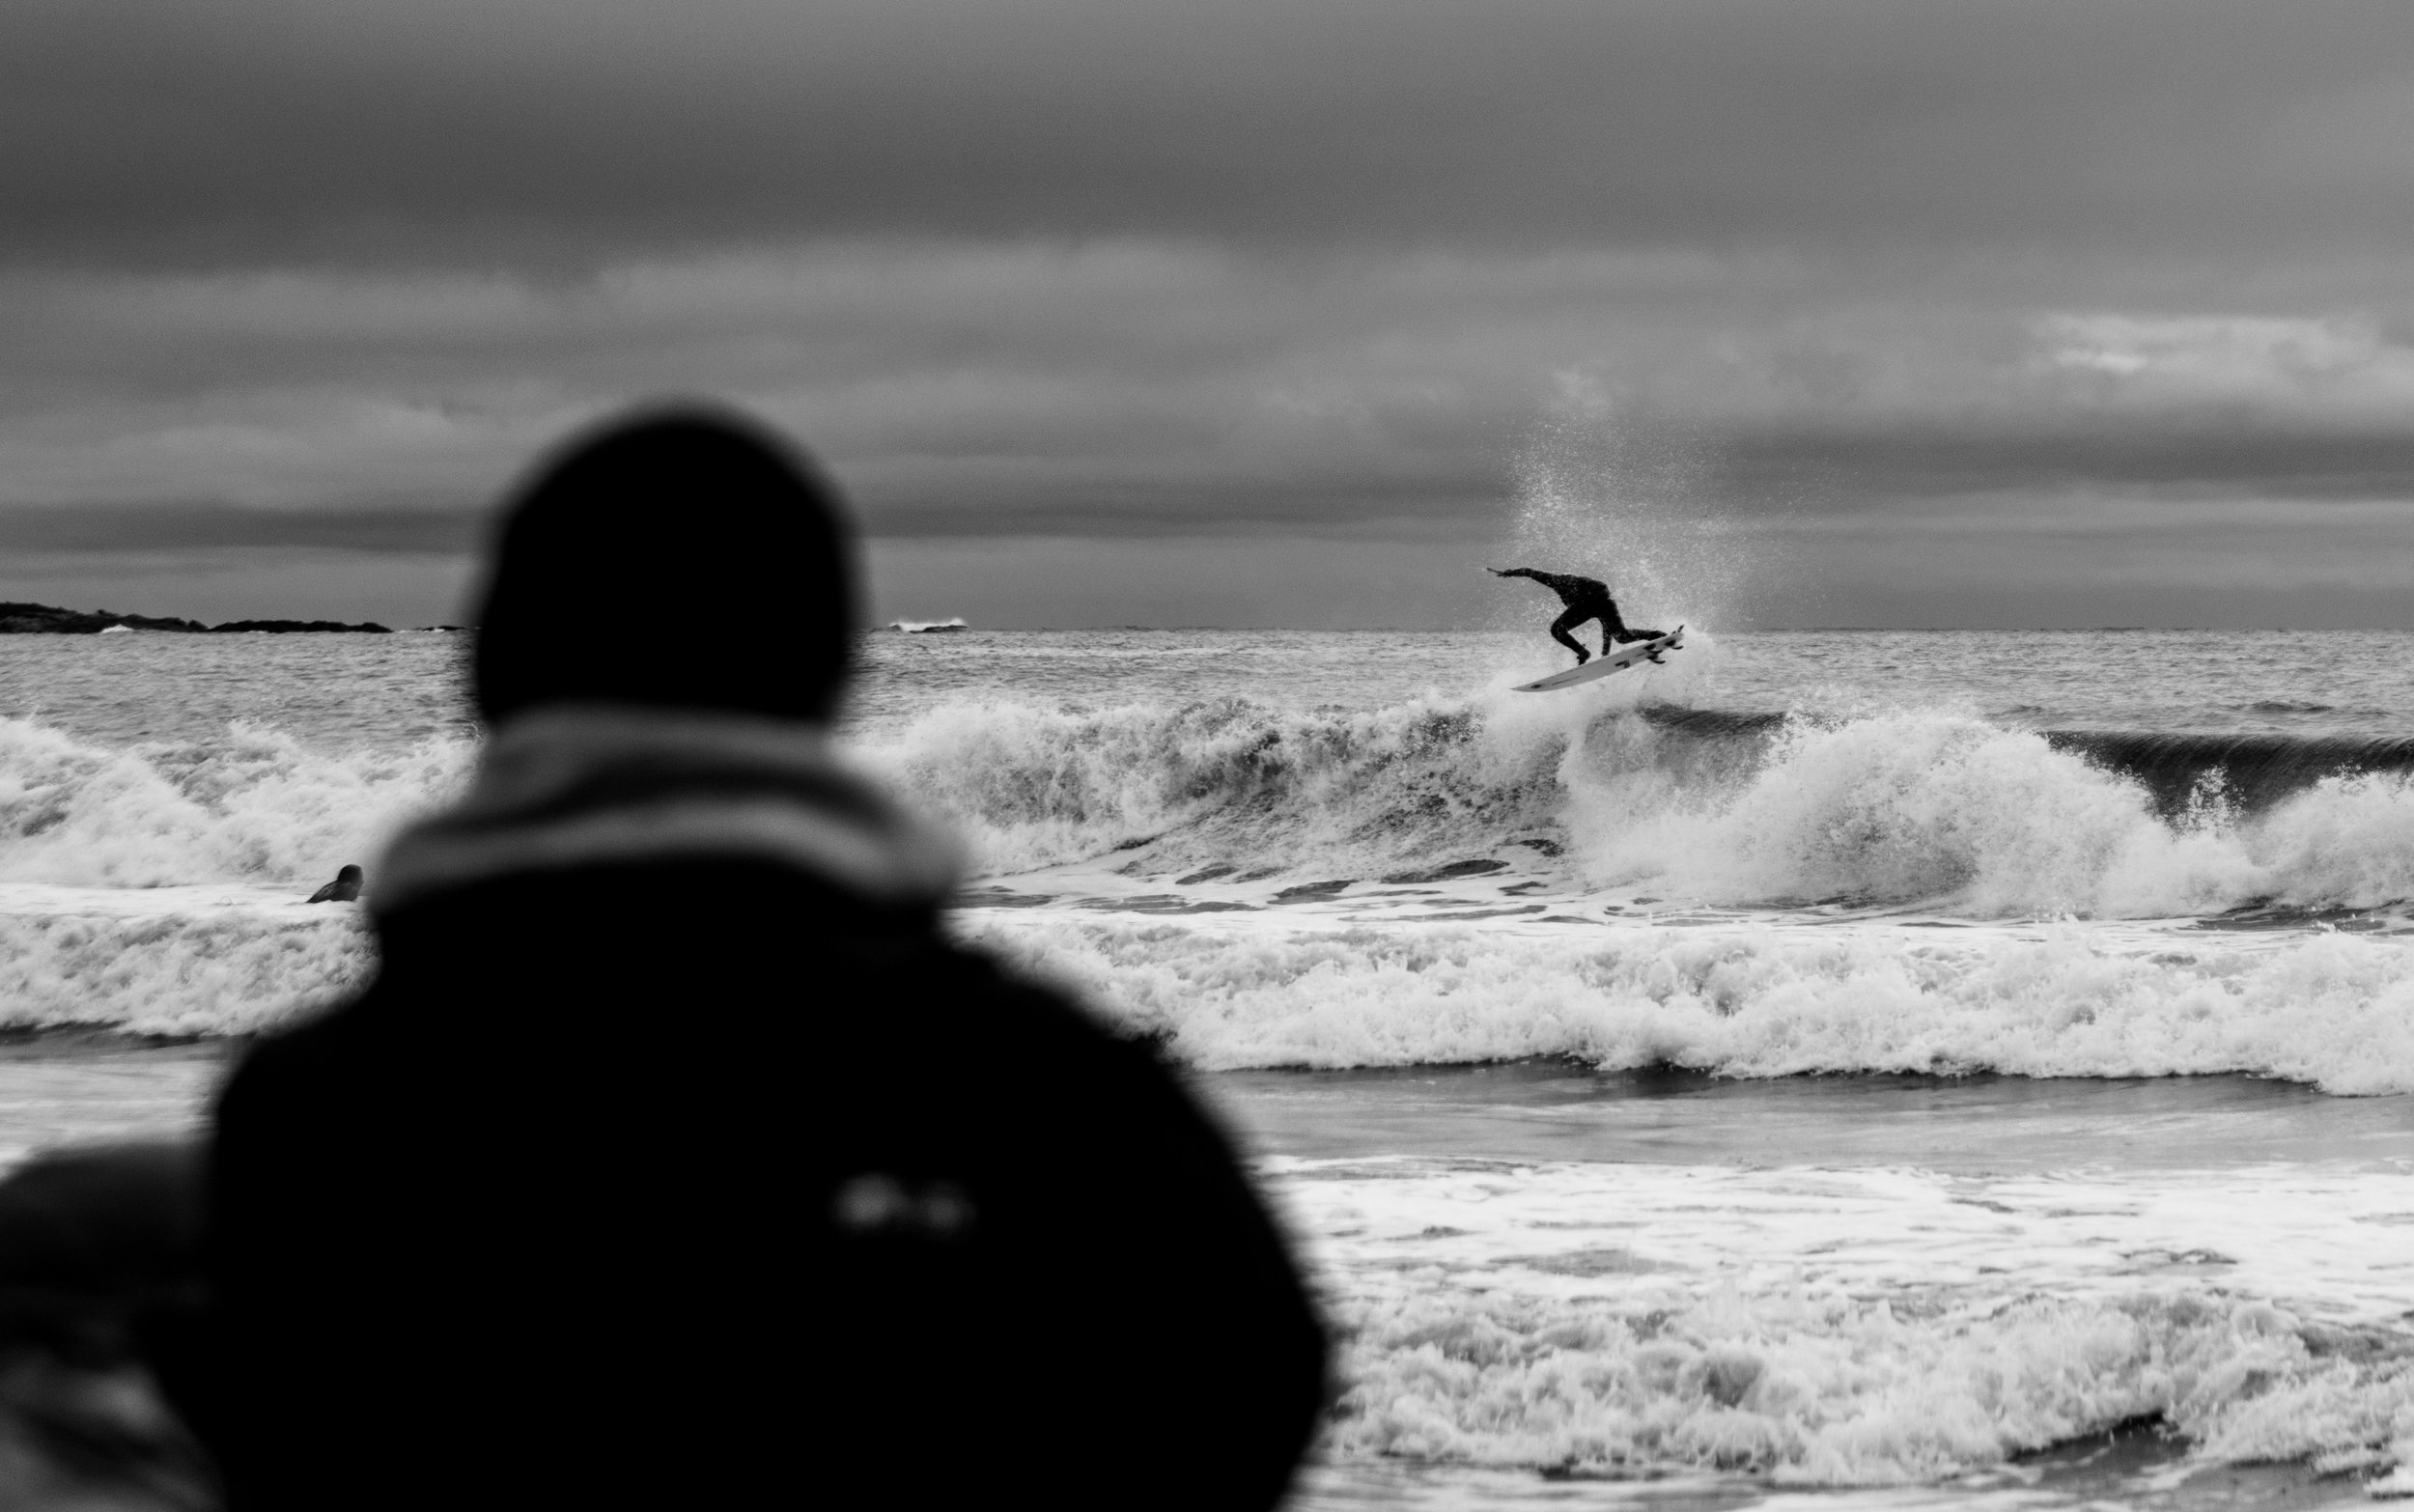 photo: Patrick Murphy, The Kings Lens